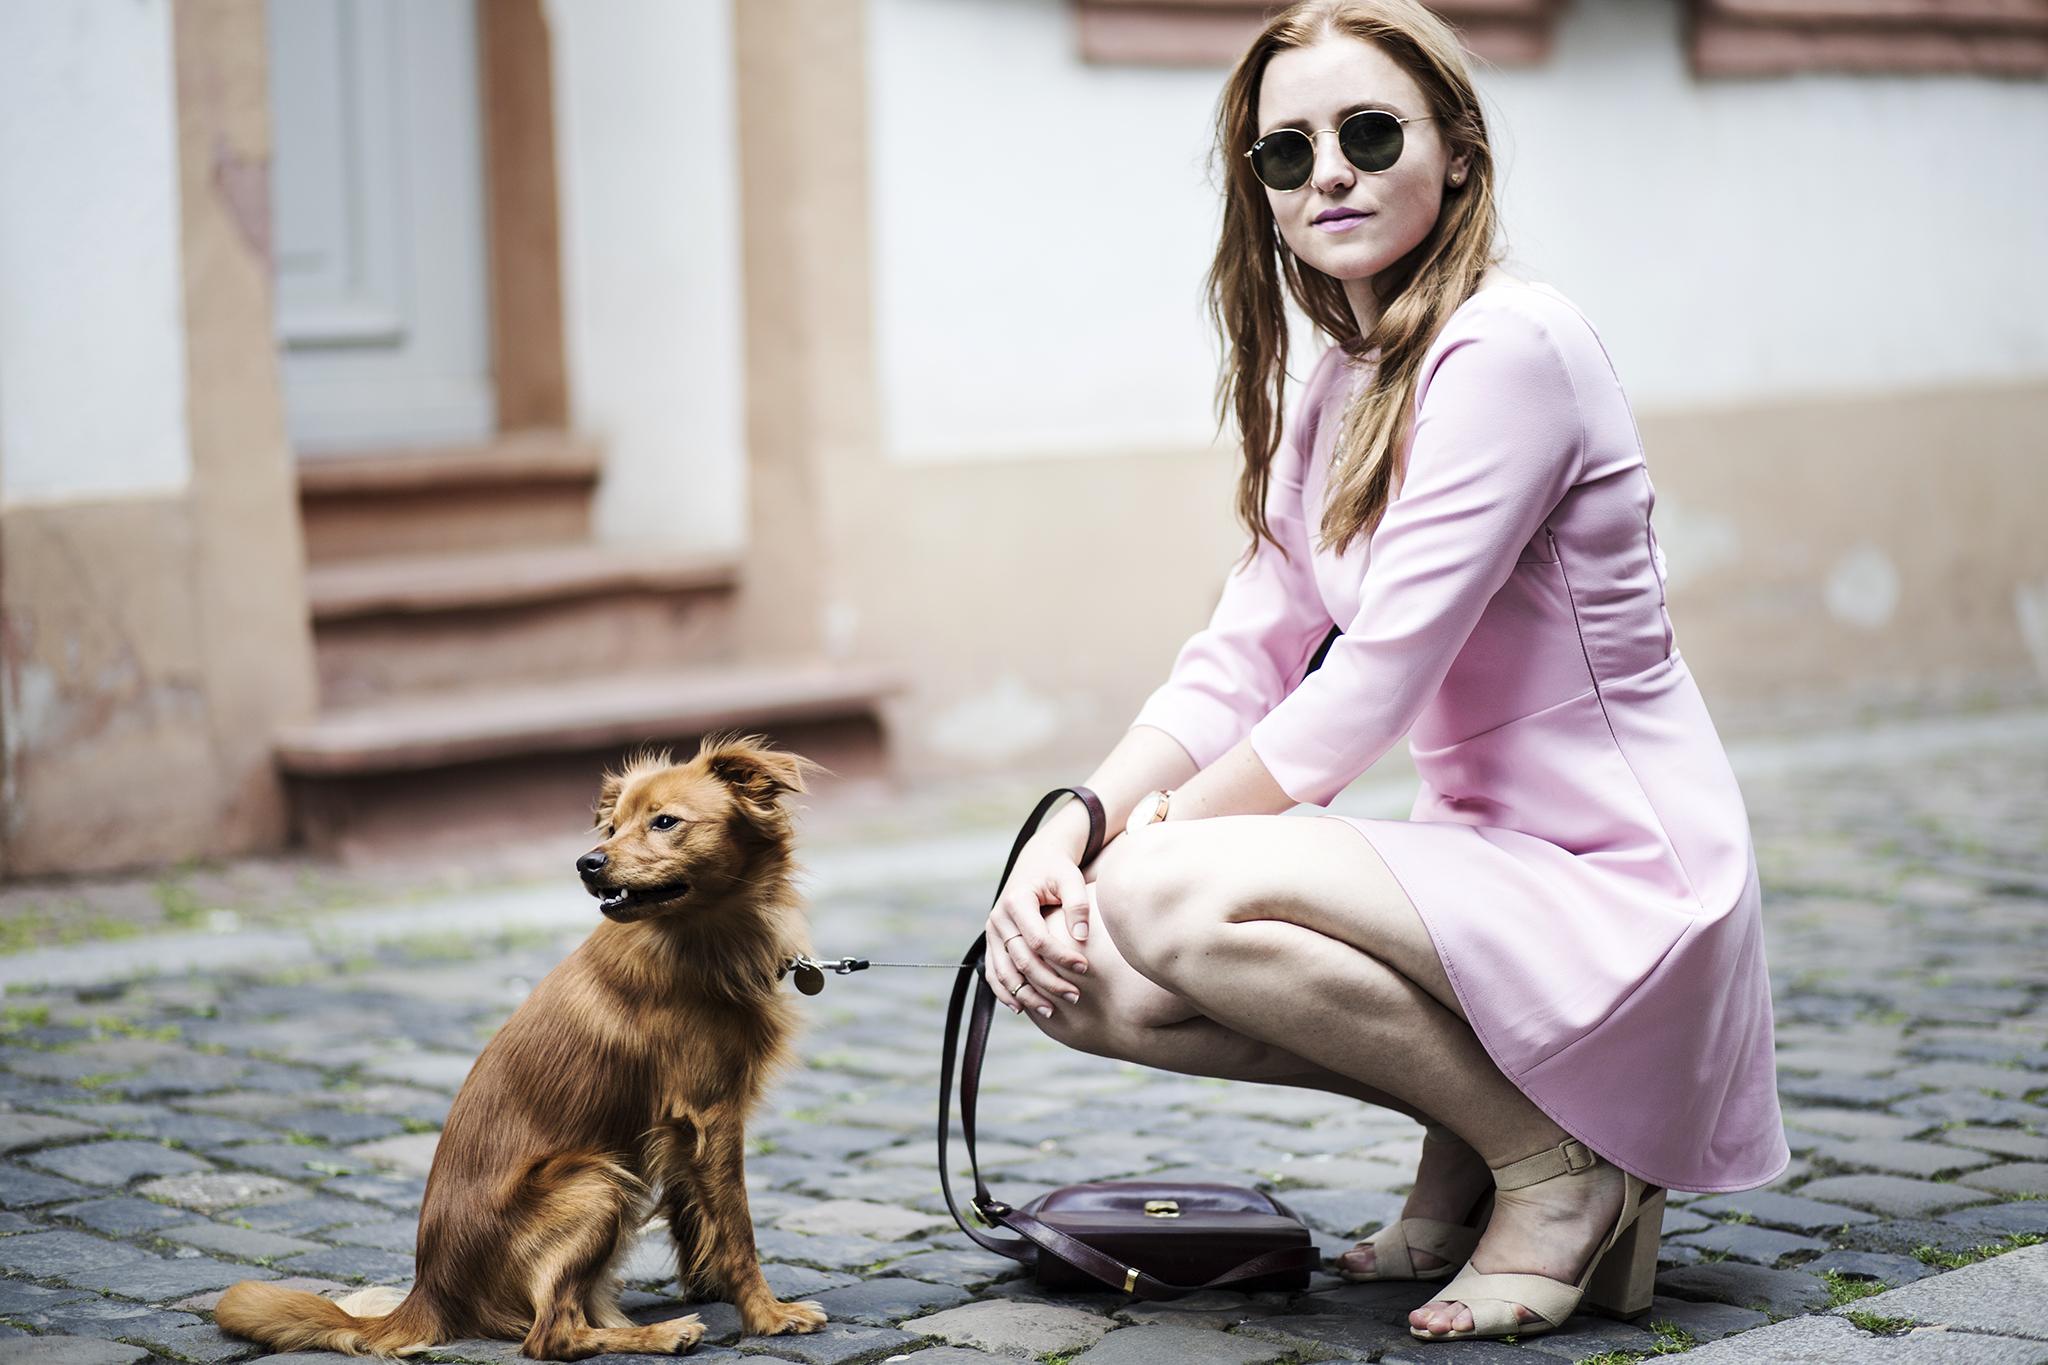 pinkdress_6